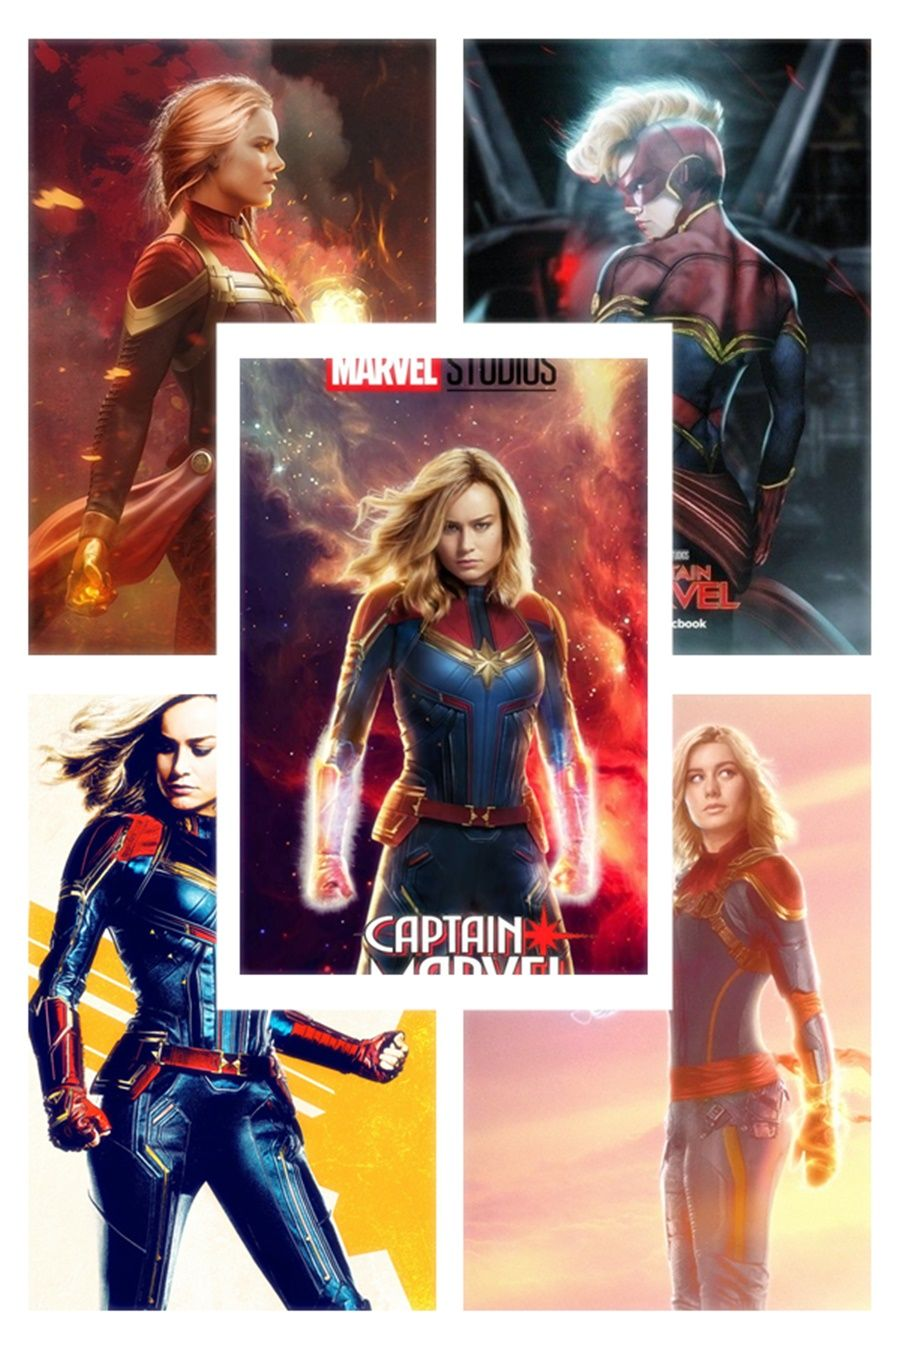 Nez Marvel Kapitany 2019 Teljes Film M A G Y A R U L Streaming Hd Marvel Film Movies